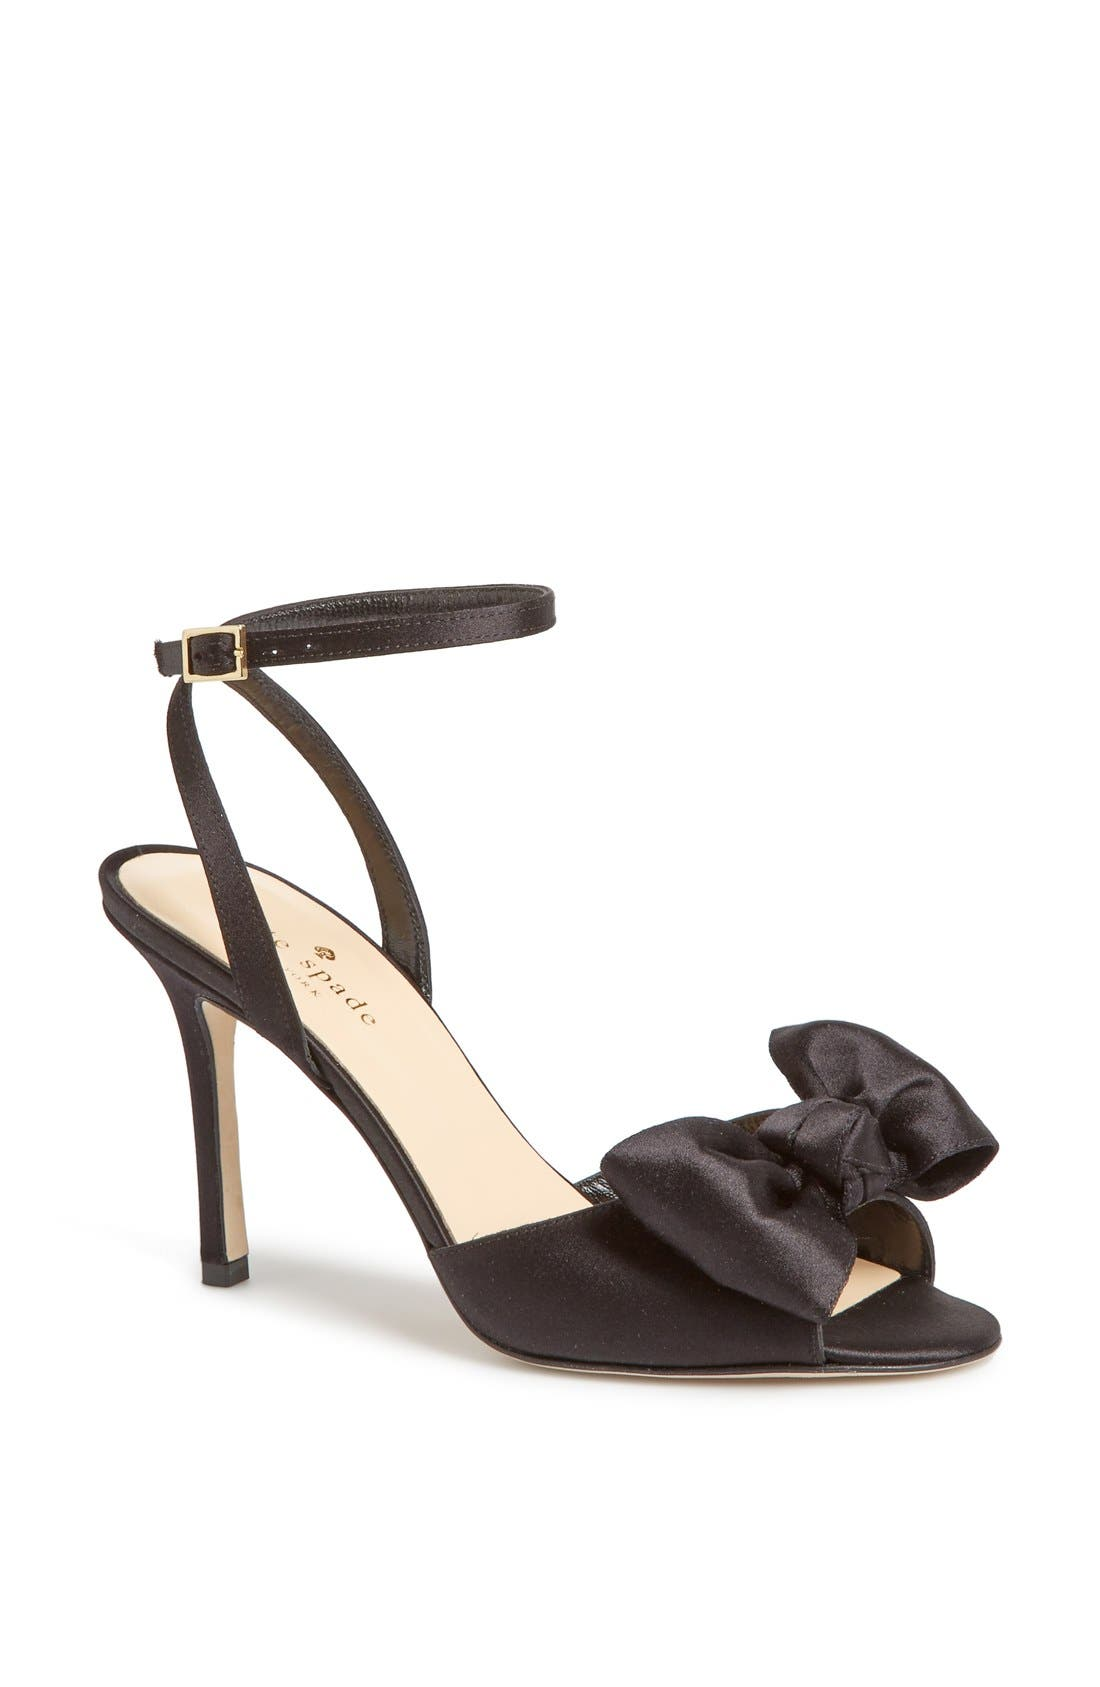 Alternate Image 1 Selected - kate spade new york 'ilexa' satin sandal